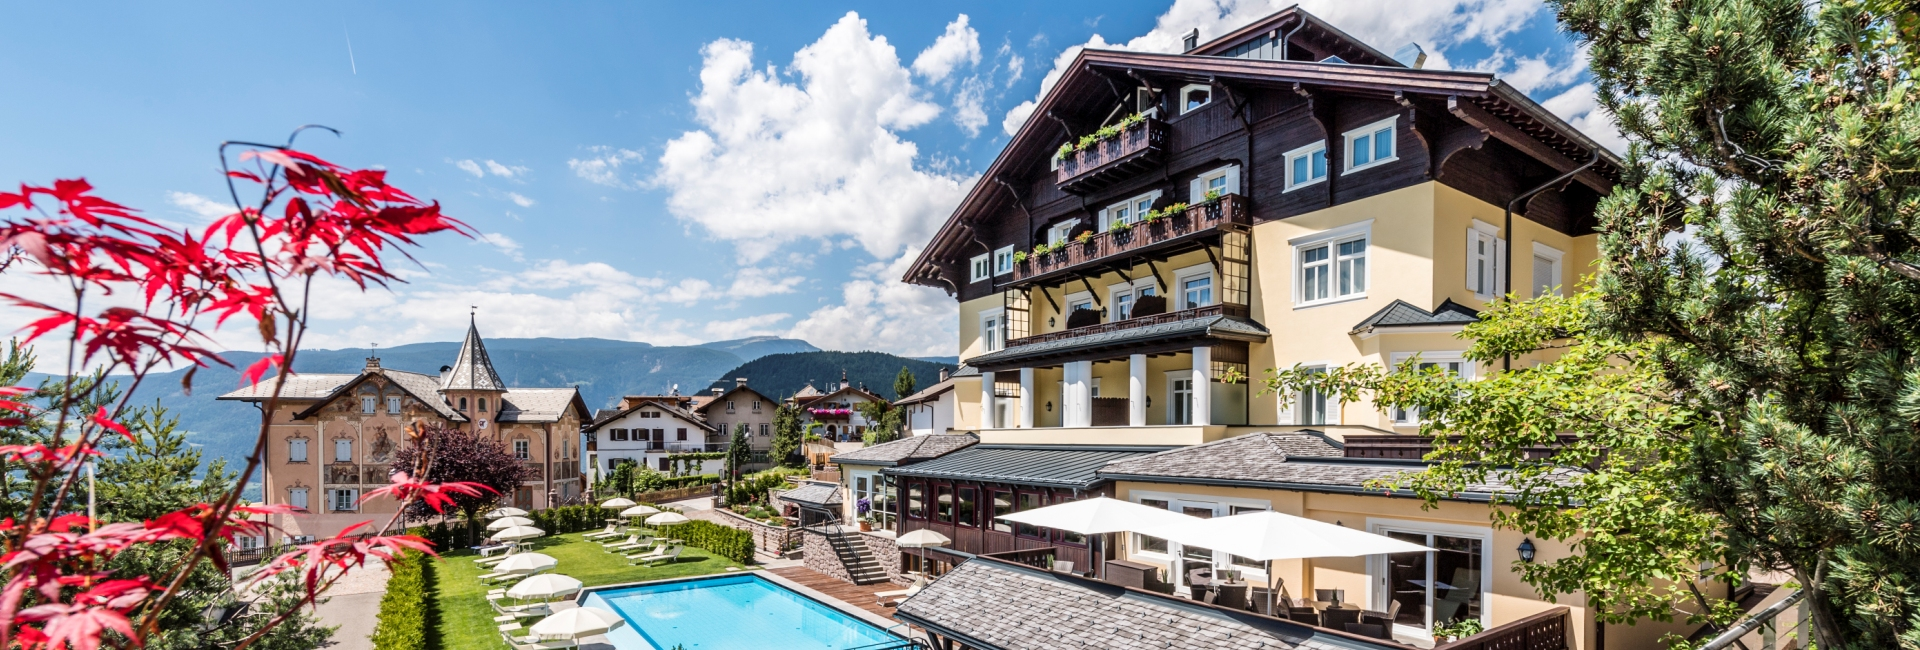 Hotel Villa Kastelruth, Dolomites, South Tyrol